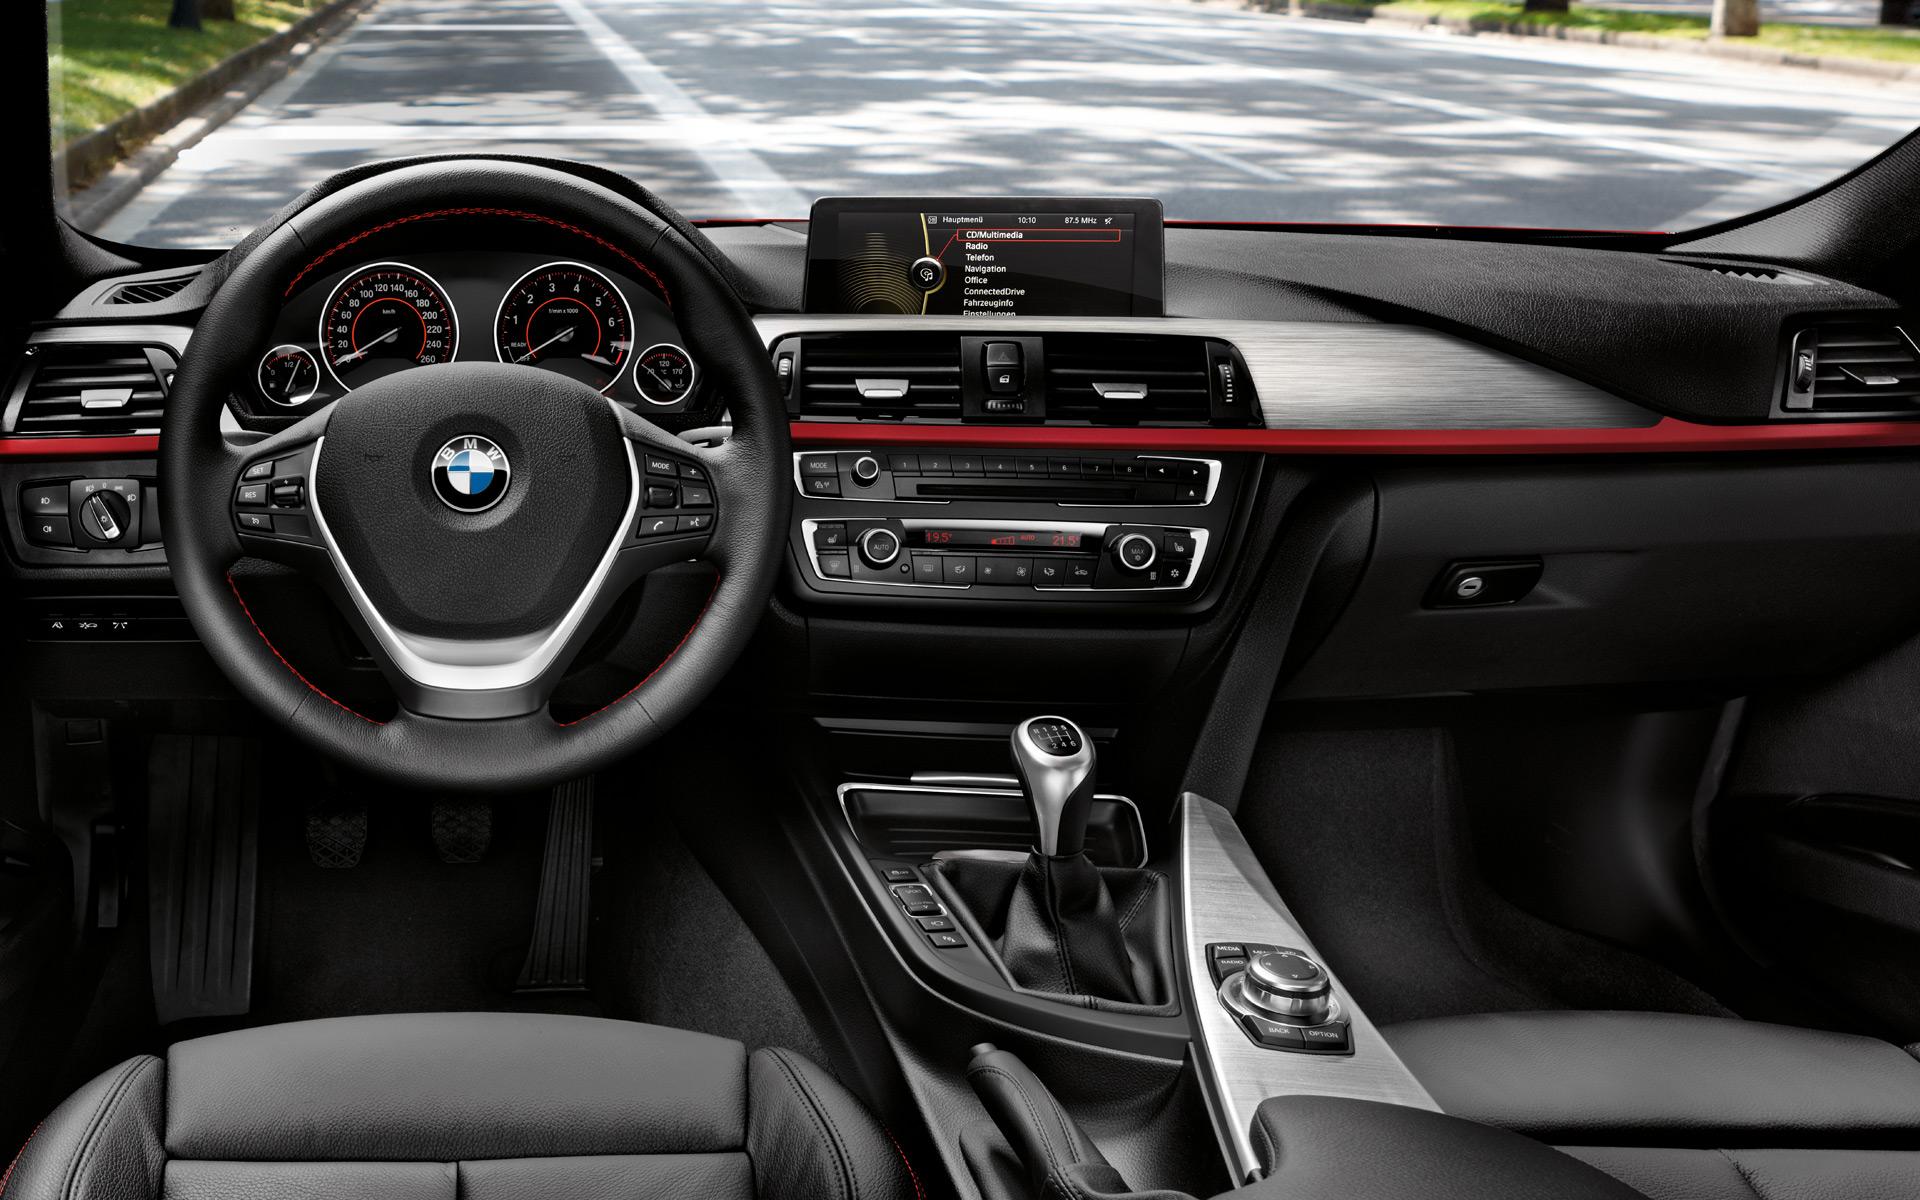 2011 BMW 328I Xdrive >> BMW 3 Series F30 Interior - Car Body Design